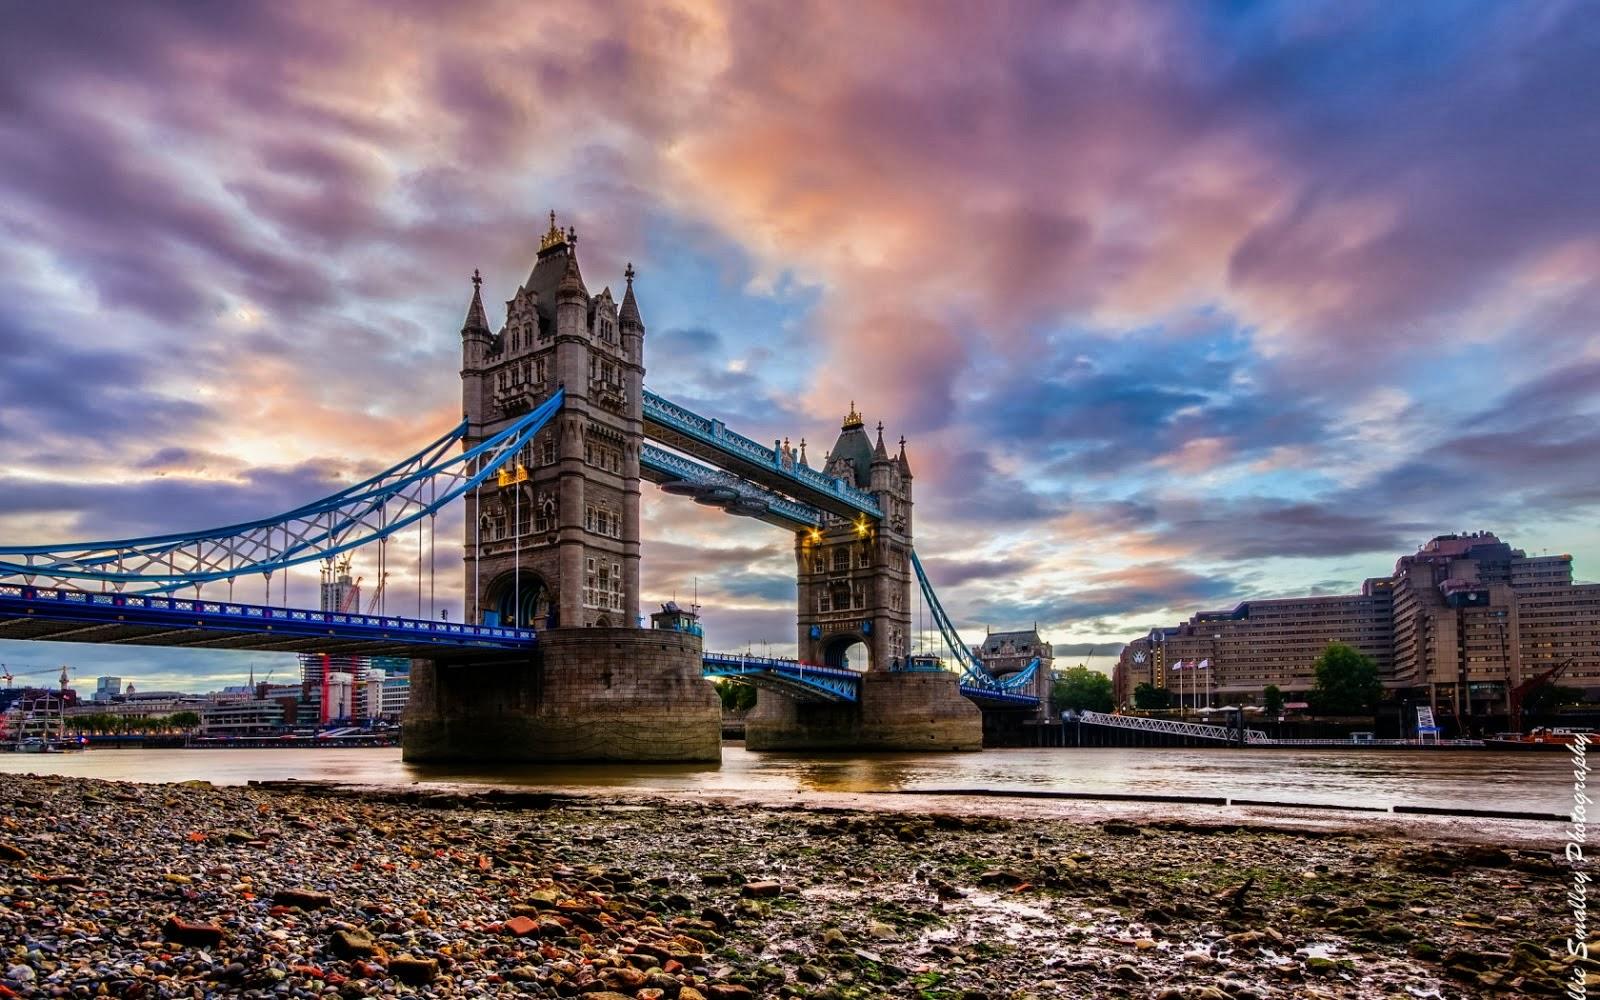 london wallpaper wallpaperwallpapersfree - photo #47